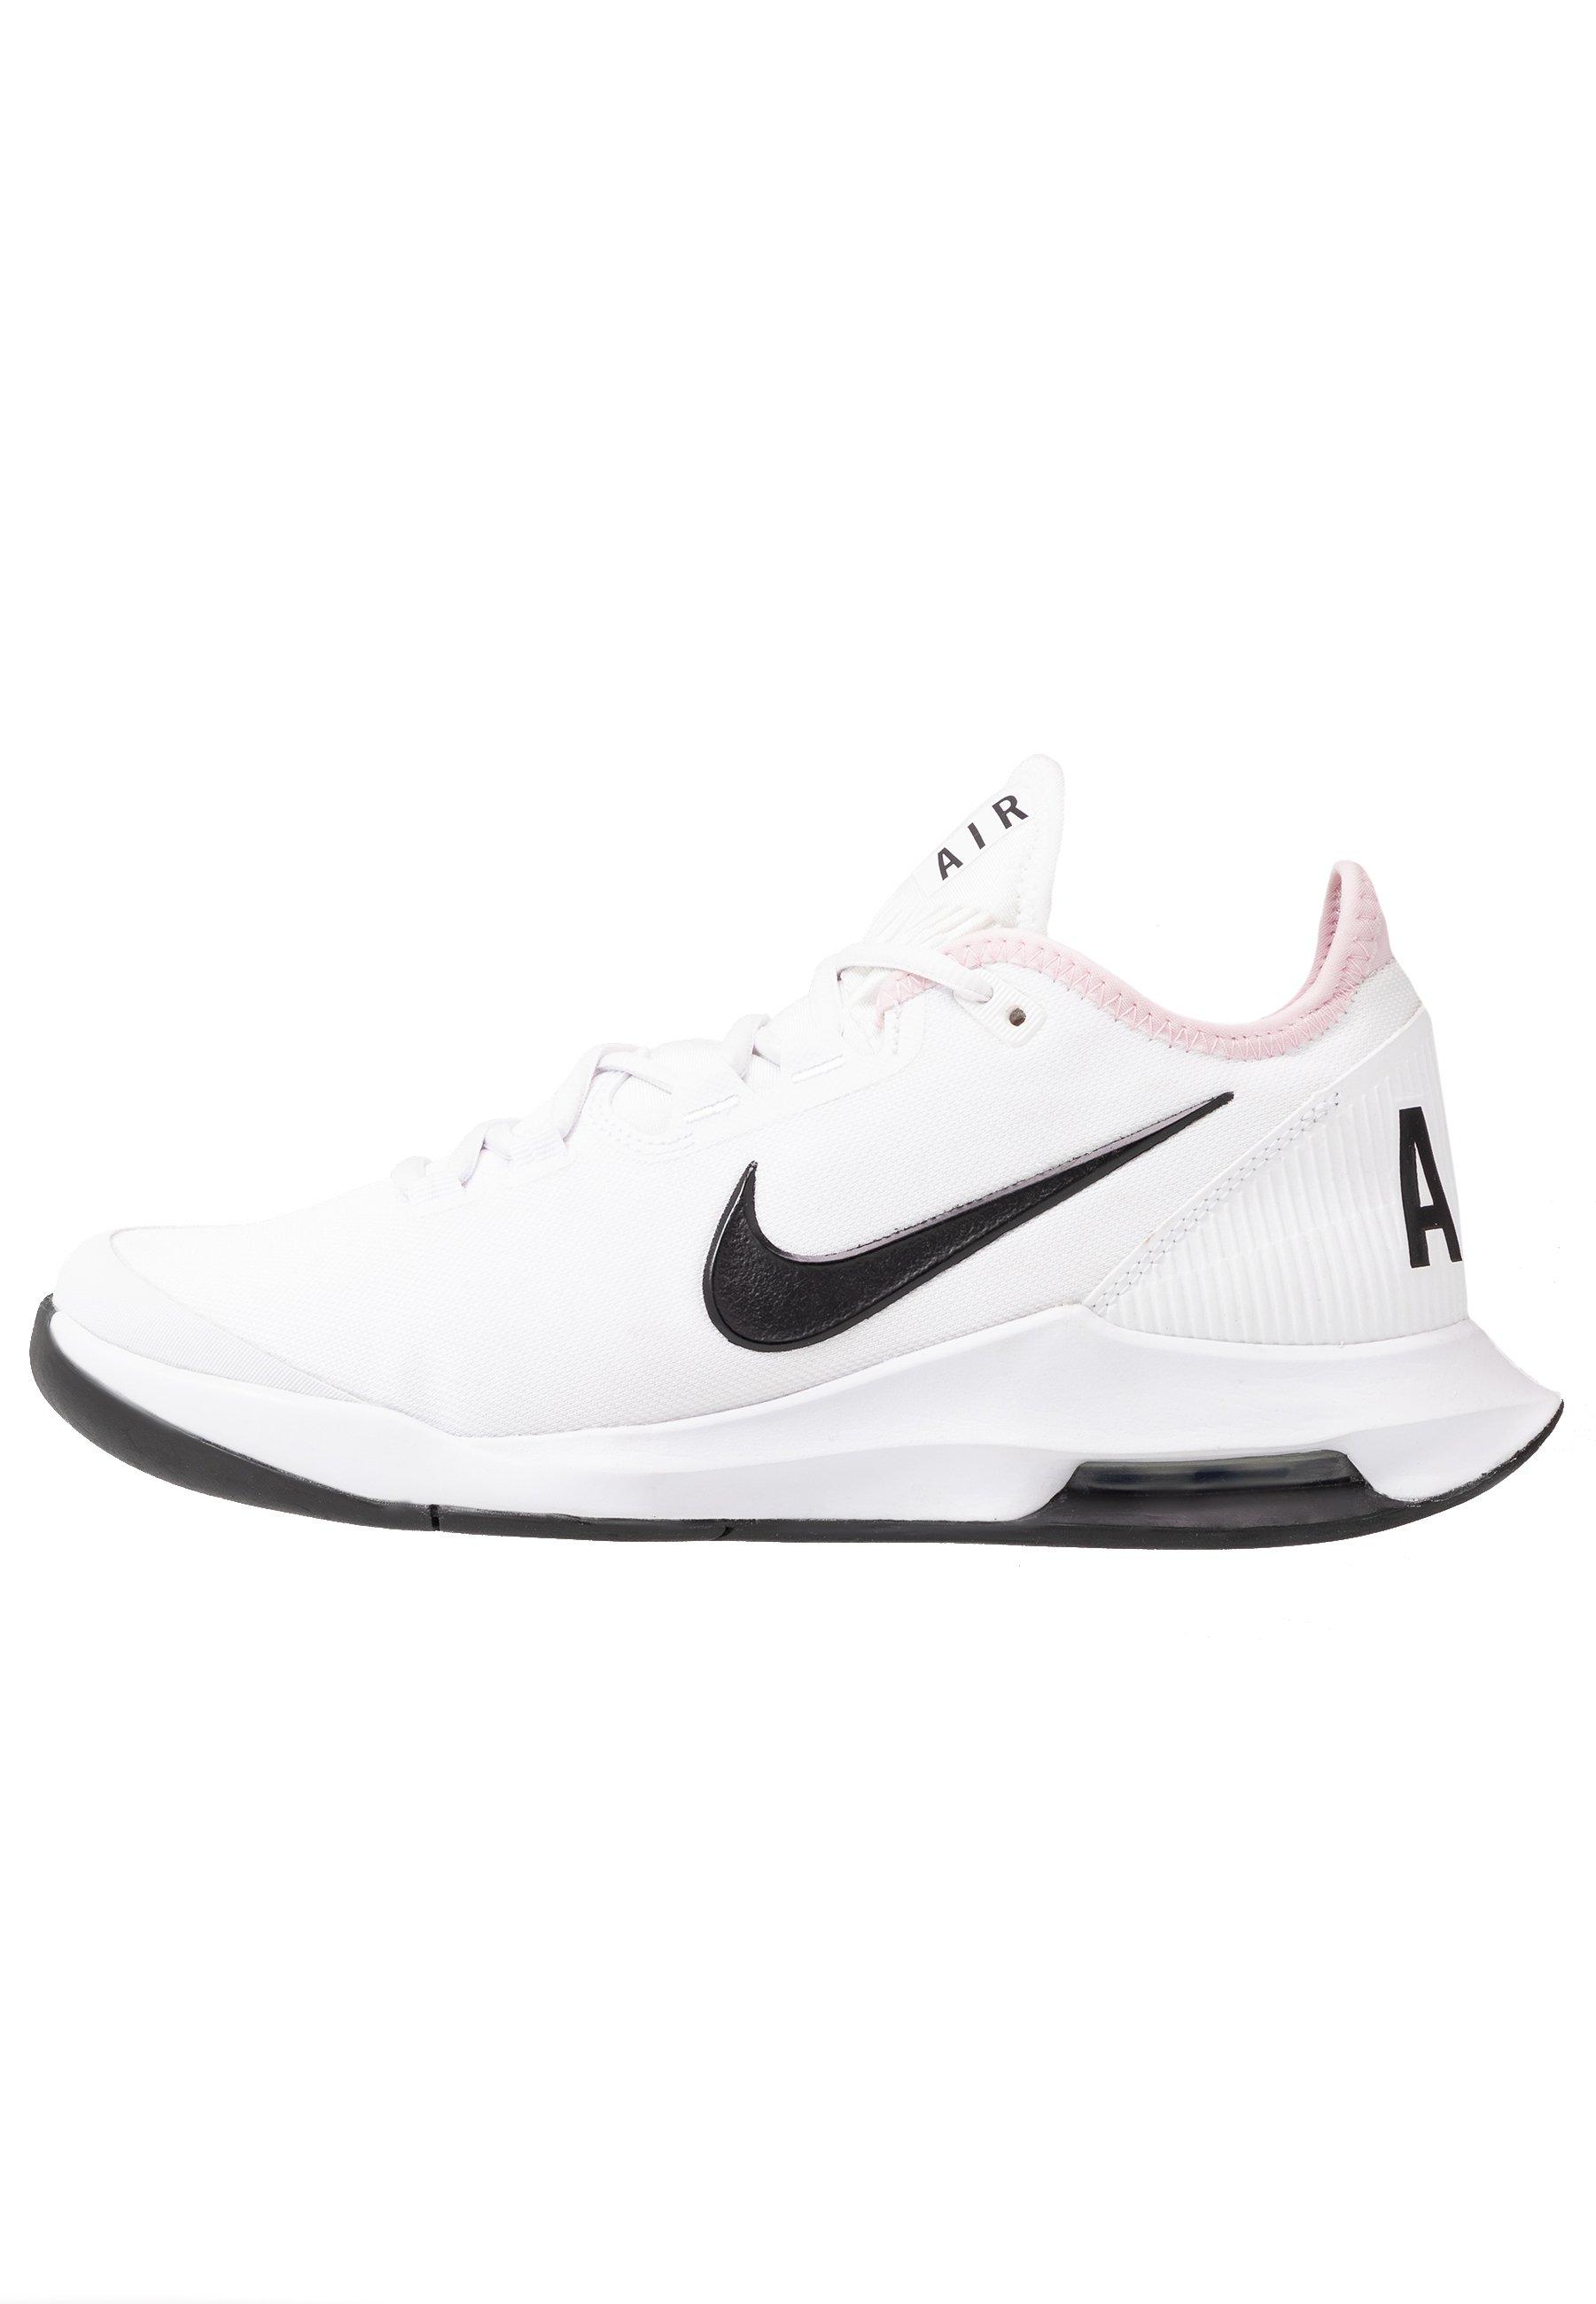 COURT AIR MAX WILDCARD - Chaussures de tennis toutes surfaces - white/black/pink foam